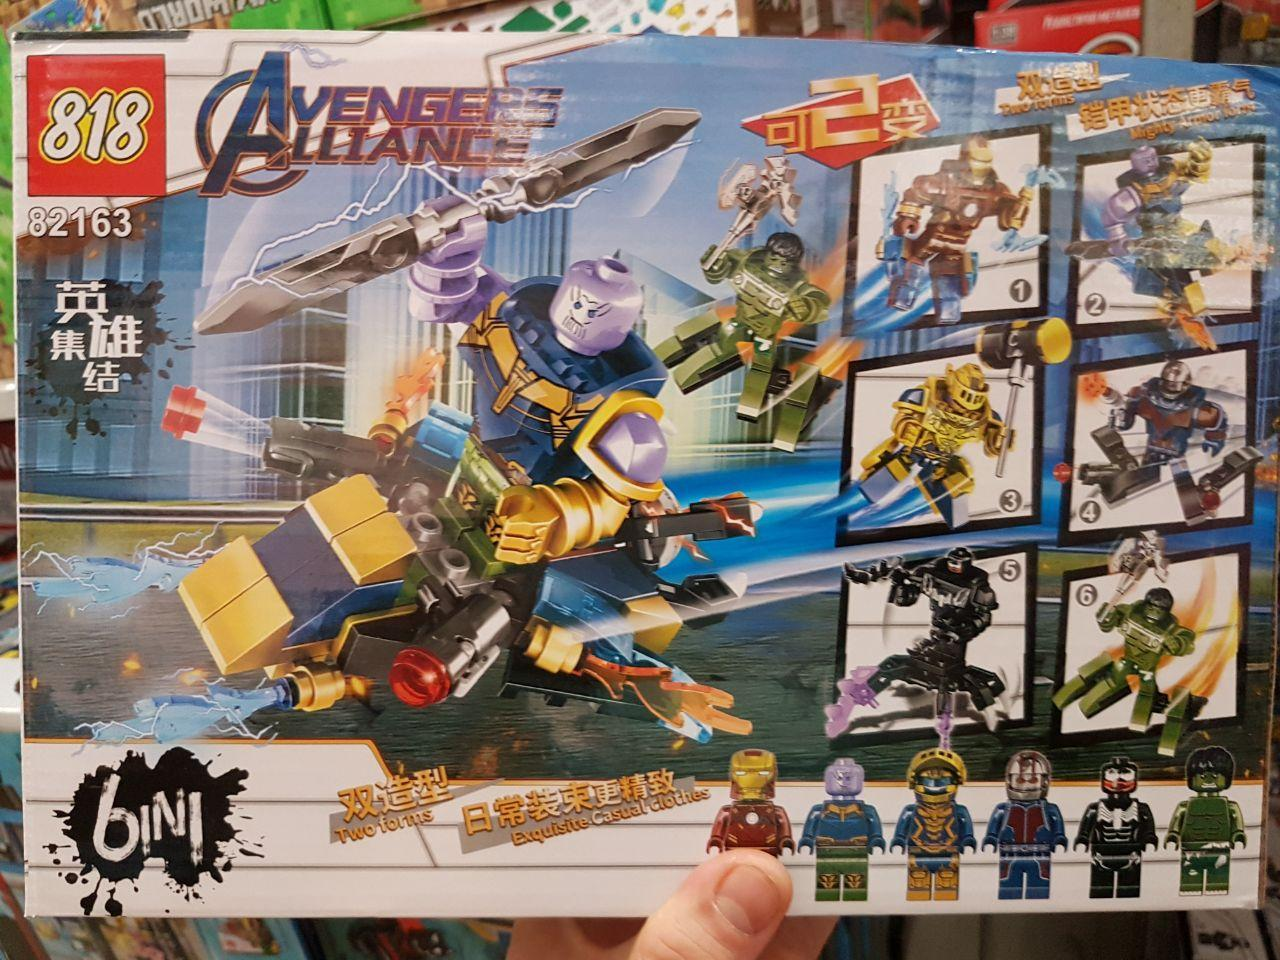 Конструктор Bela 82163 Набор конструкторов 6 в 1 Мстители Avengers